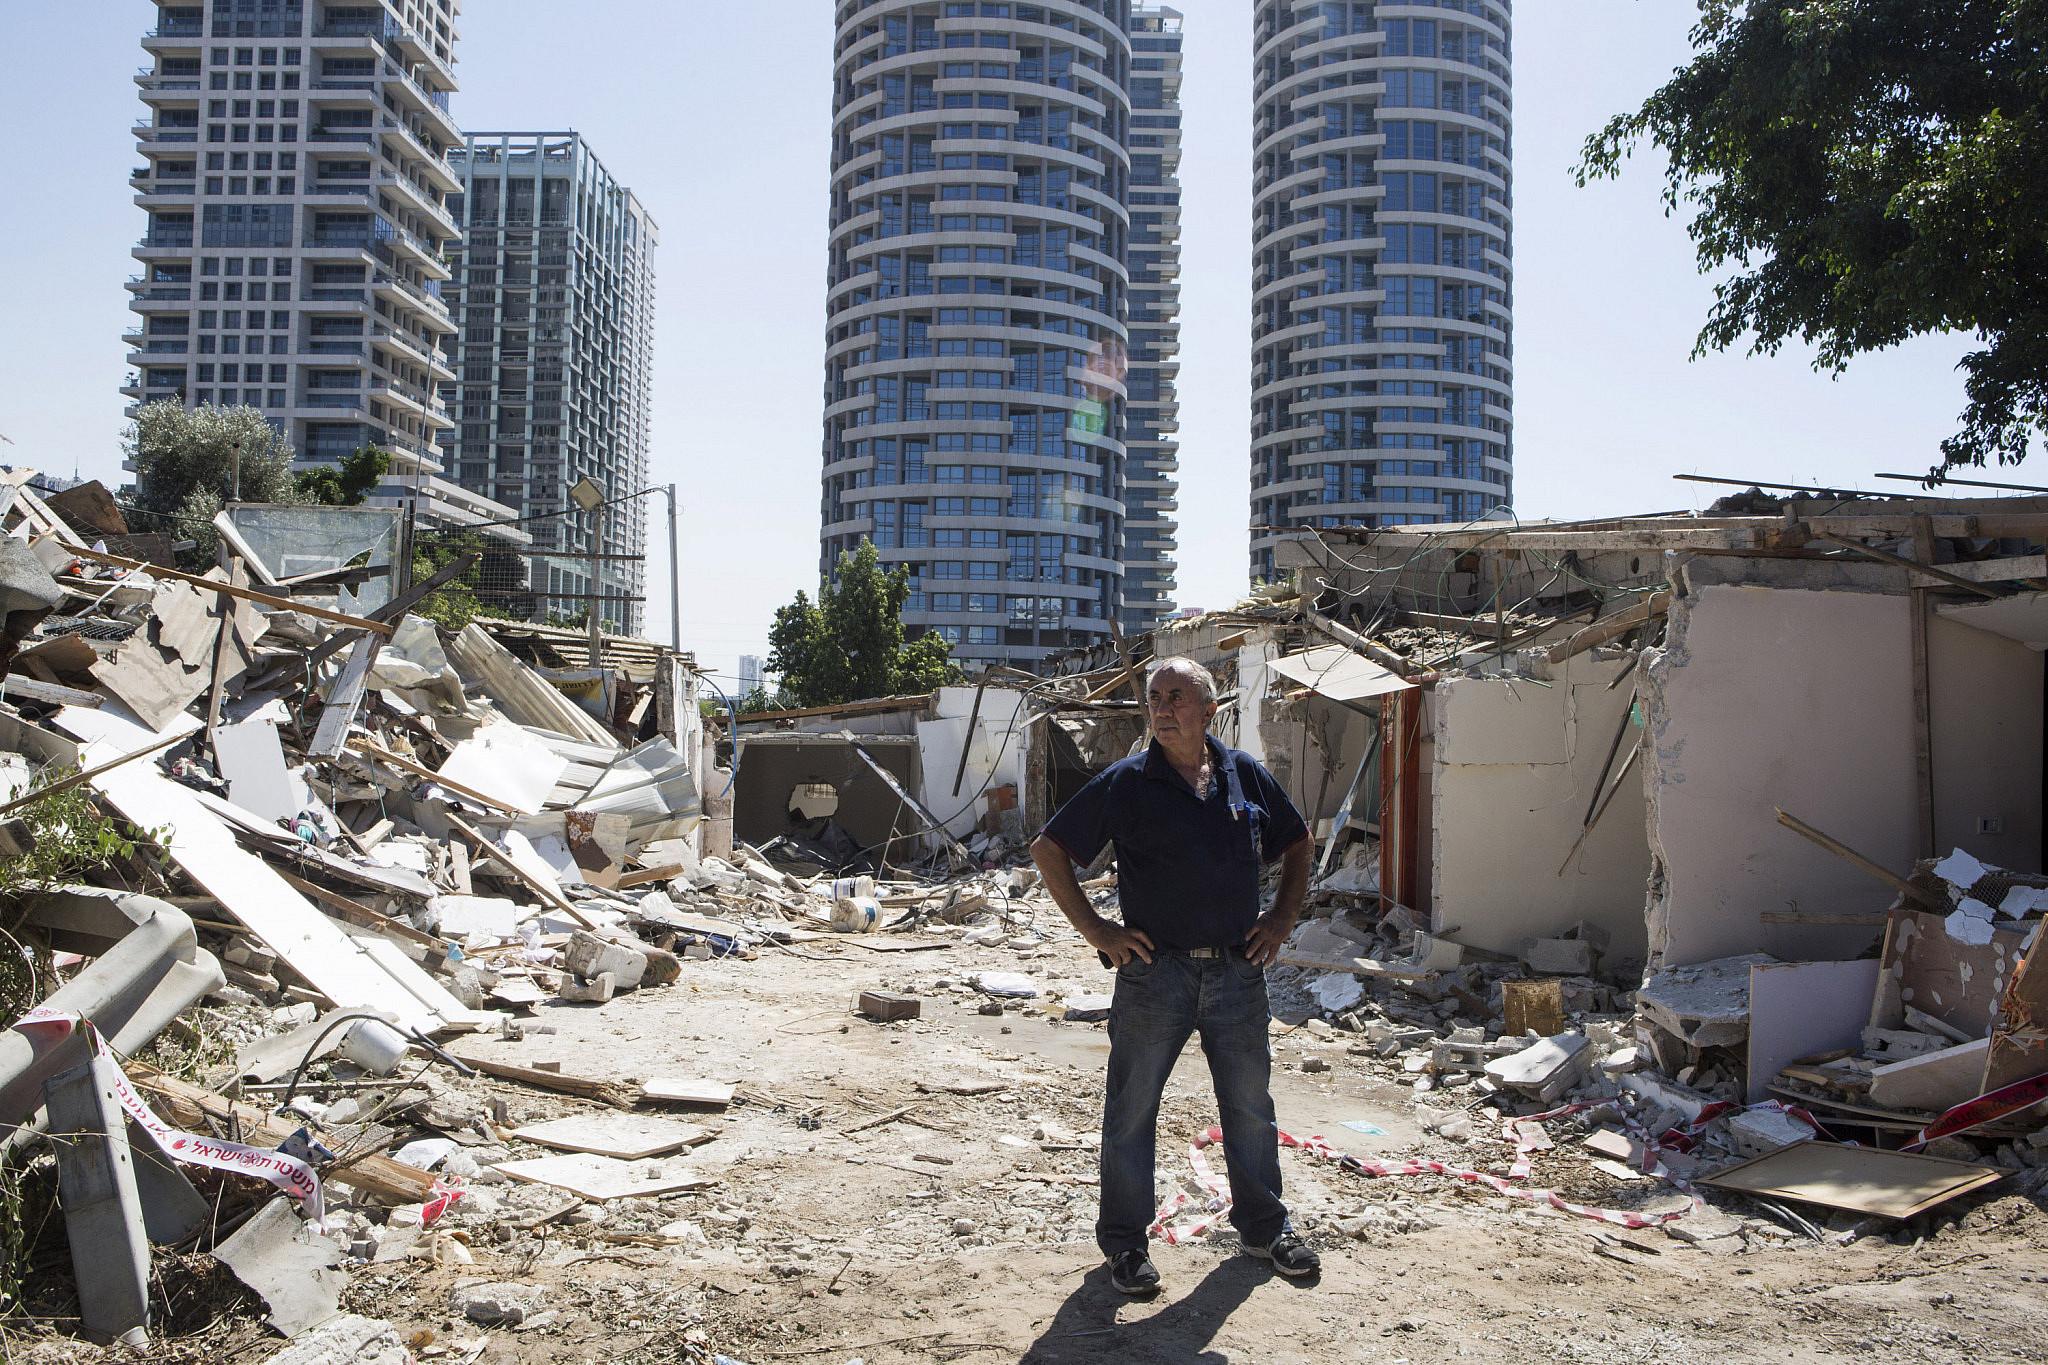 Kaduri Halif stands between the rubble of his destroyed home, Givat Amal, Tel Aviv, September 18, 2014. (Keren Manor/Activestills)